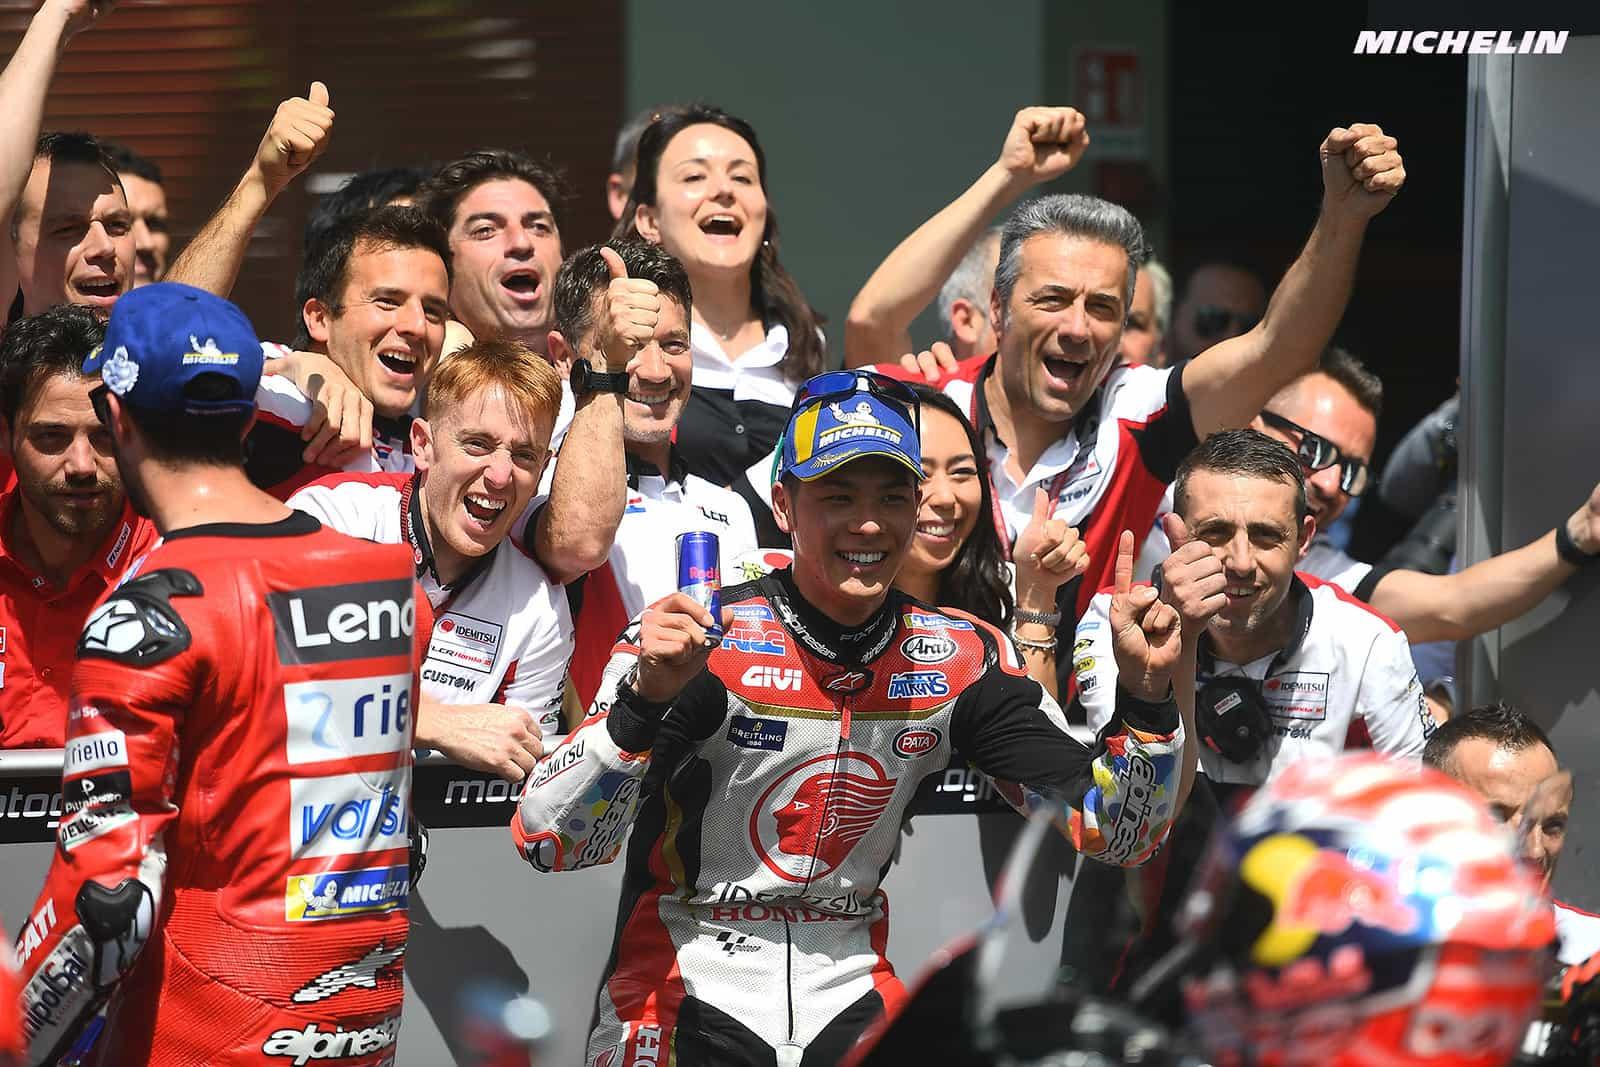 MotoGP2019イタリアGP5位 中上 貴晶 「素晴らしい1日になった」